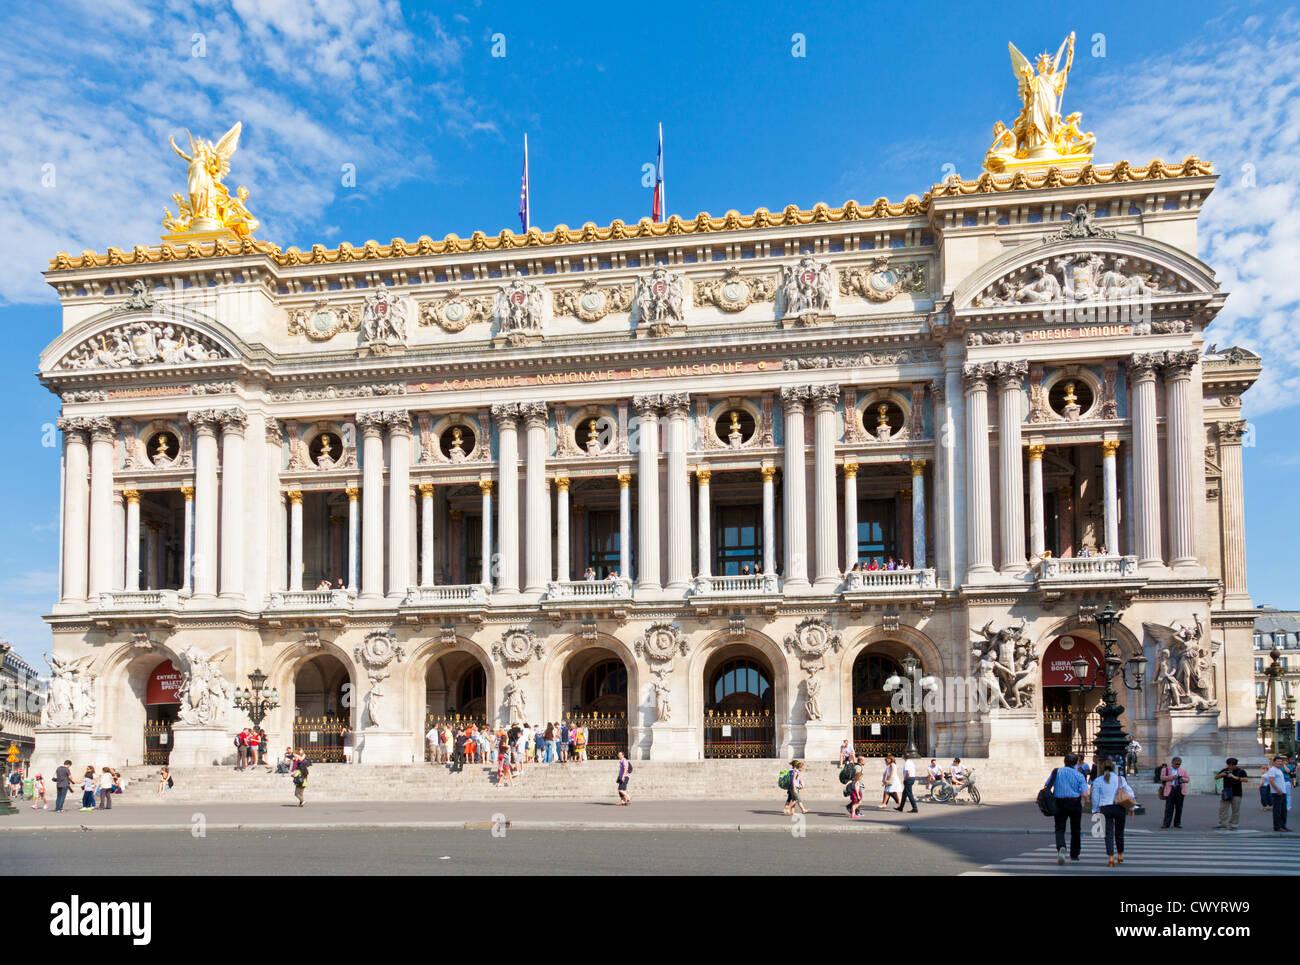 Opera Garnier, Place de l'Opera, Paris, France, Europe EU - Stock Image